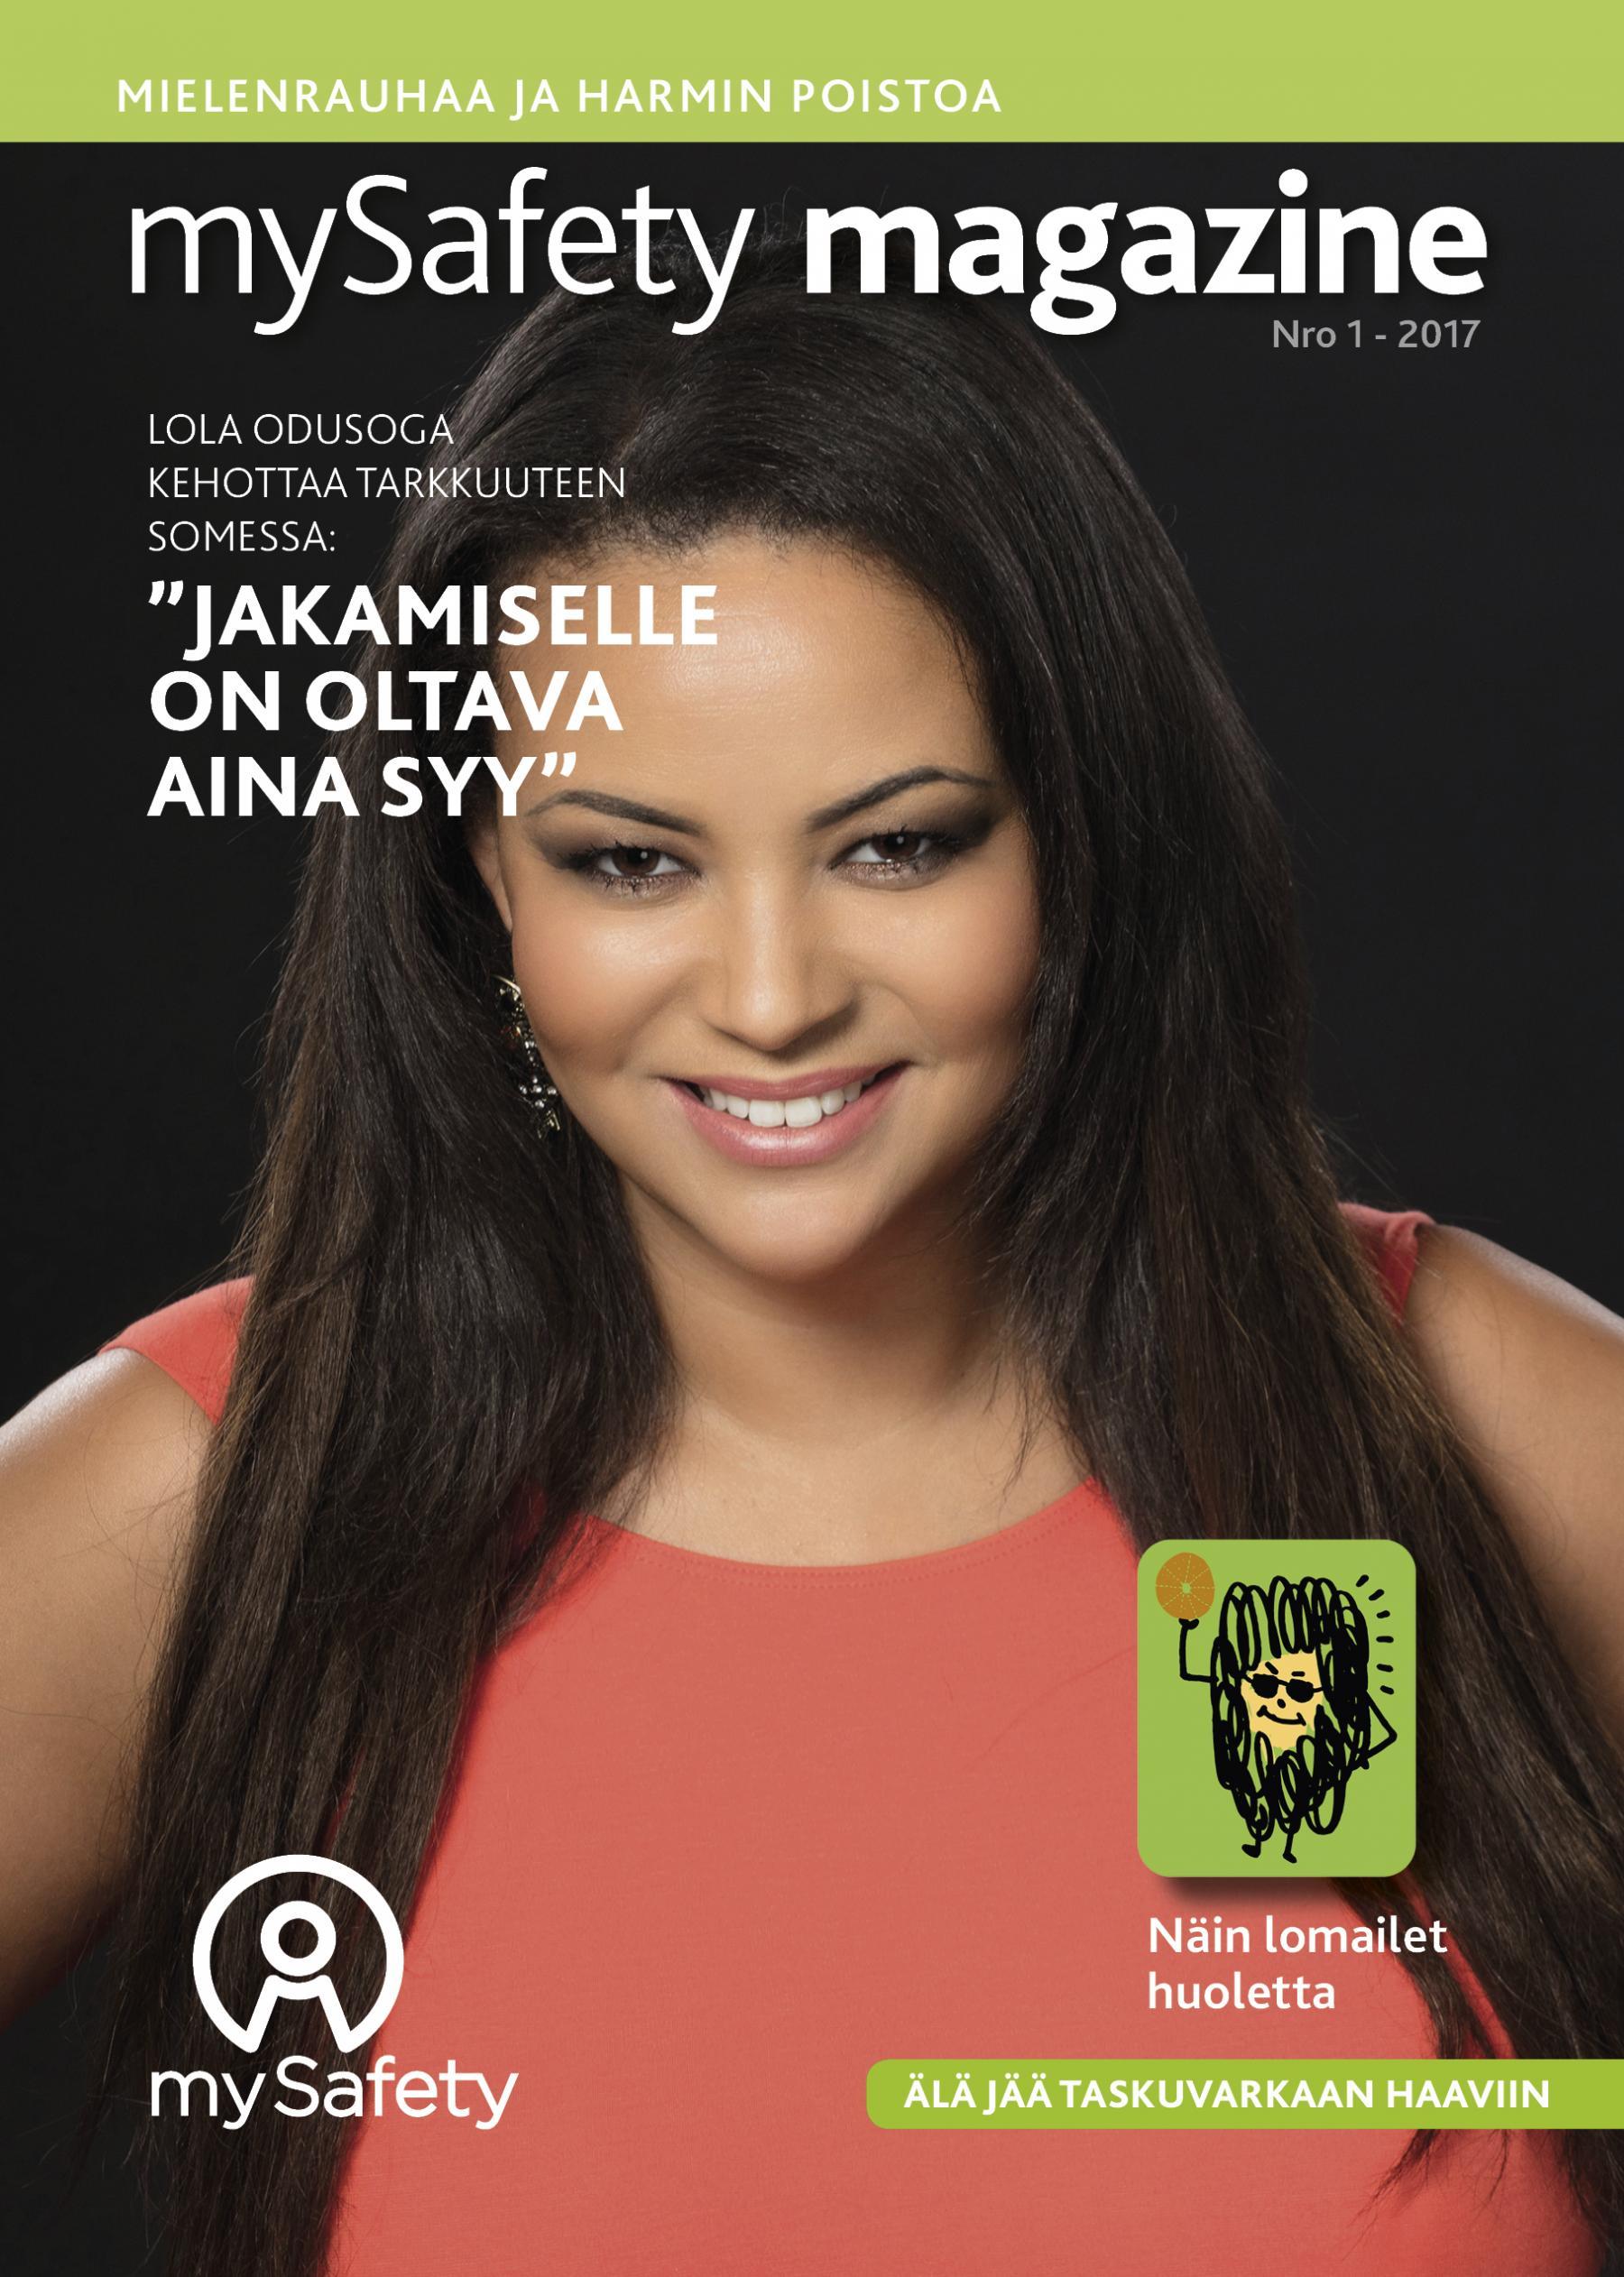 magazine_cover_1_2017.jpg